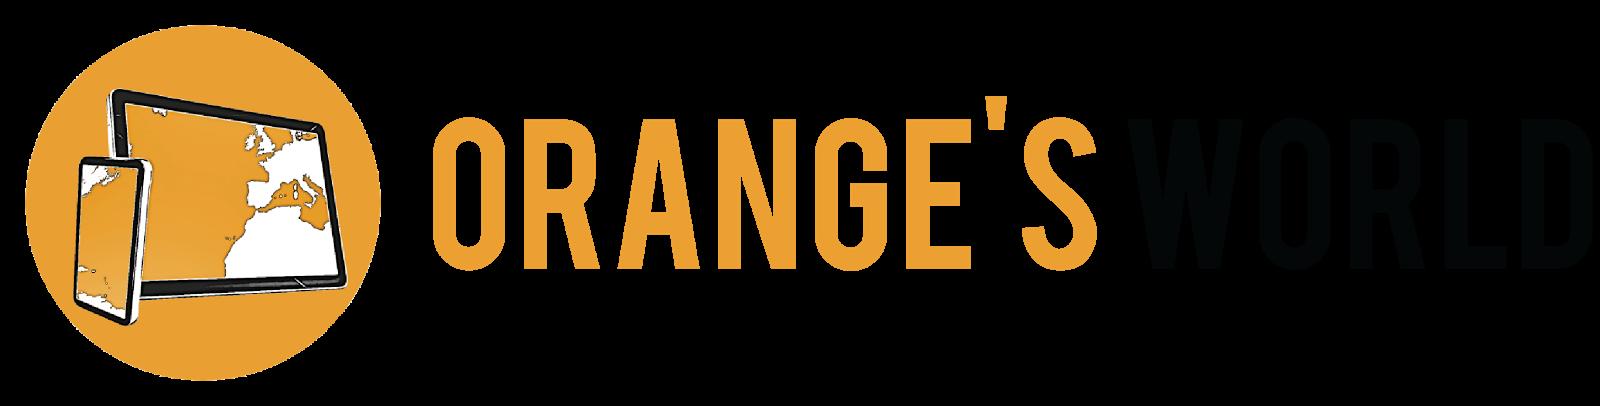 Orange's World